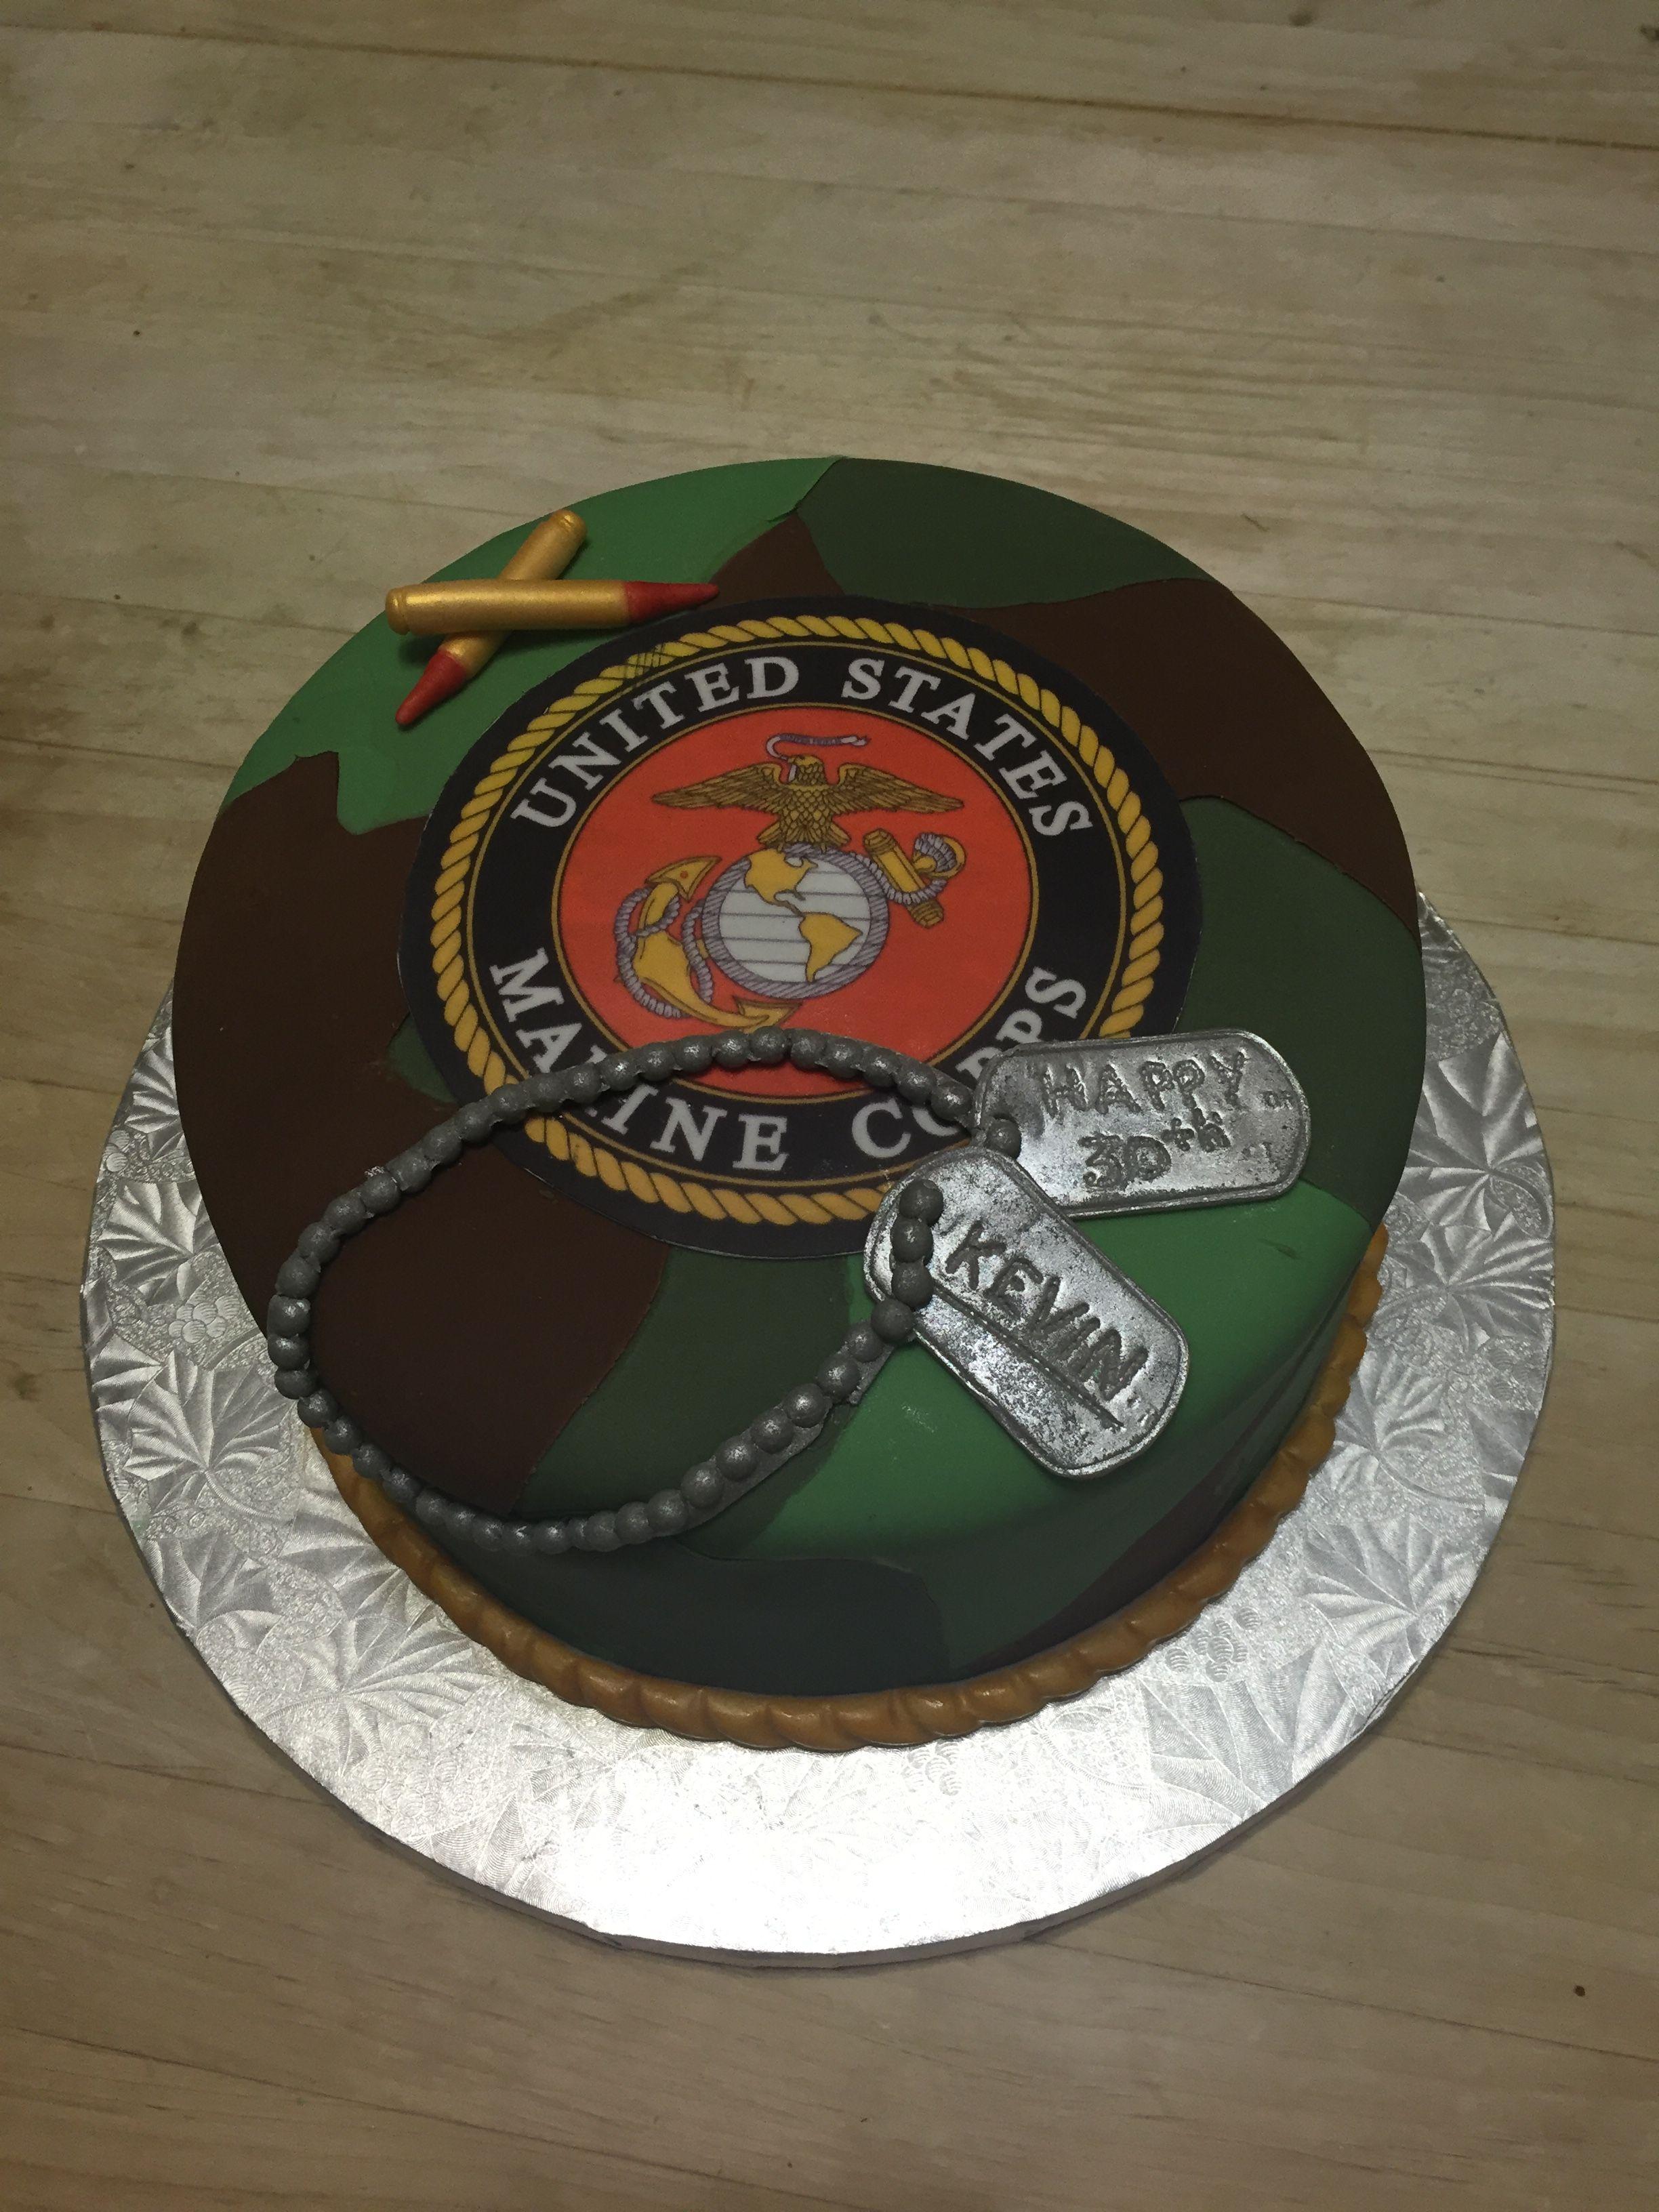 cakesbytina marinecake Marine cake, Cake, Desserts